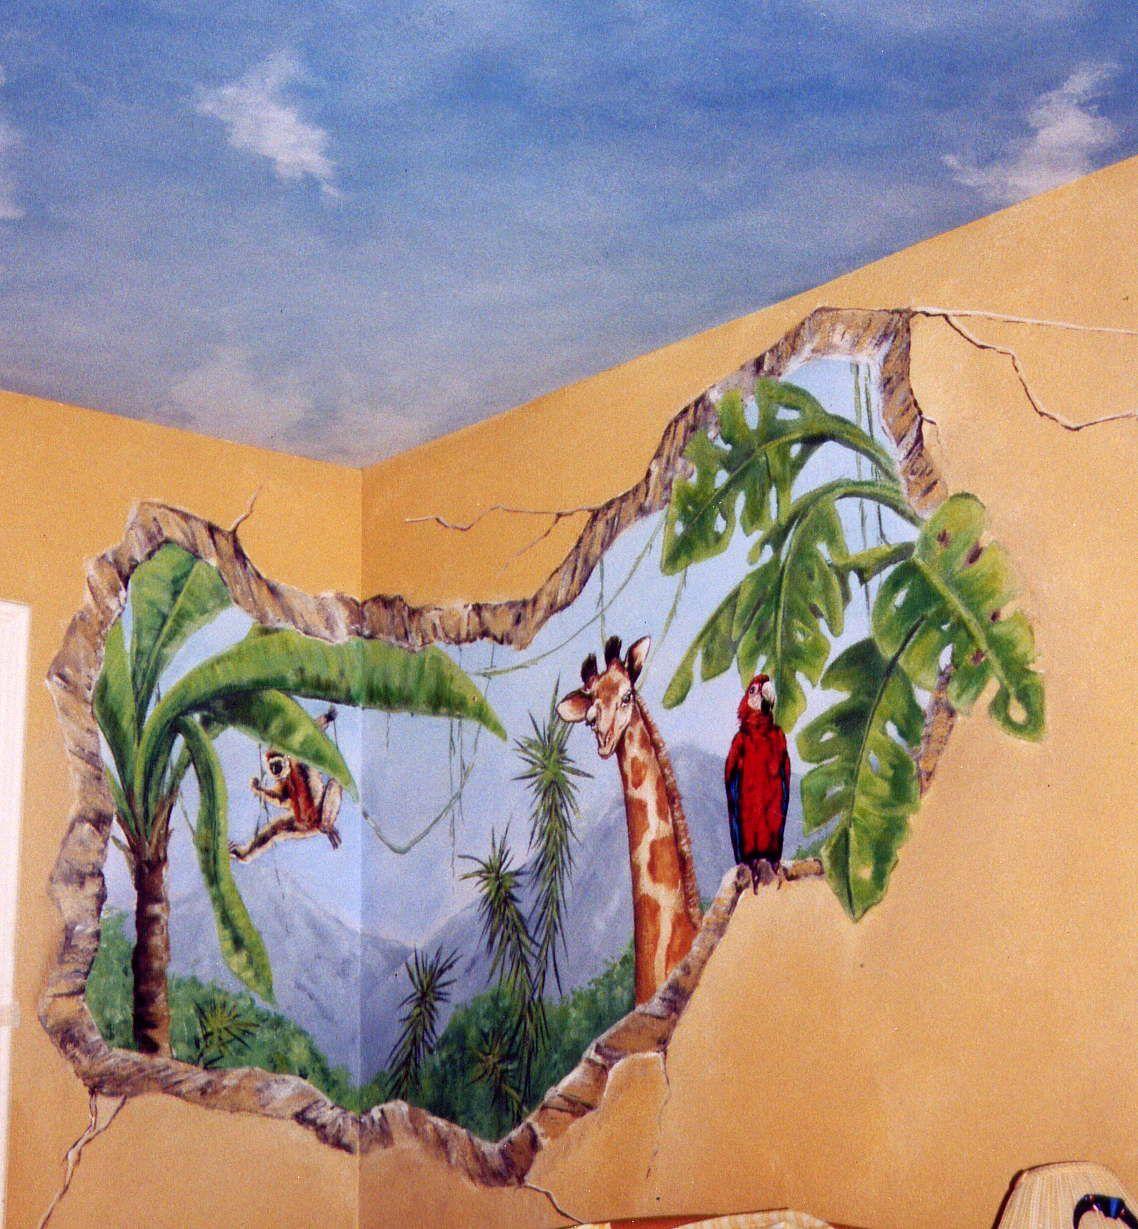 Jungle Wall Mural Painted By Anibus Studios Anibus Studios